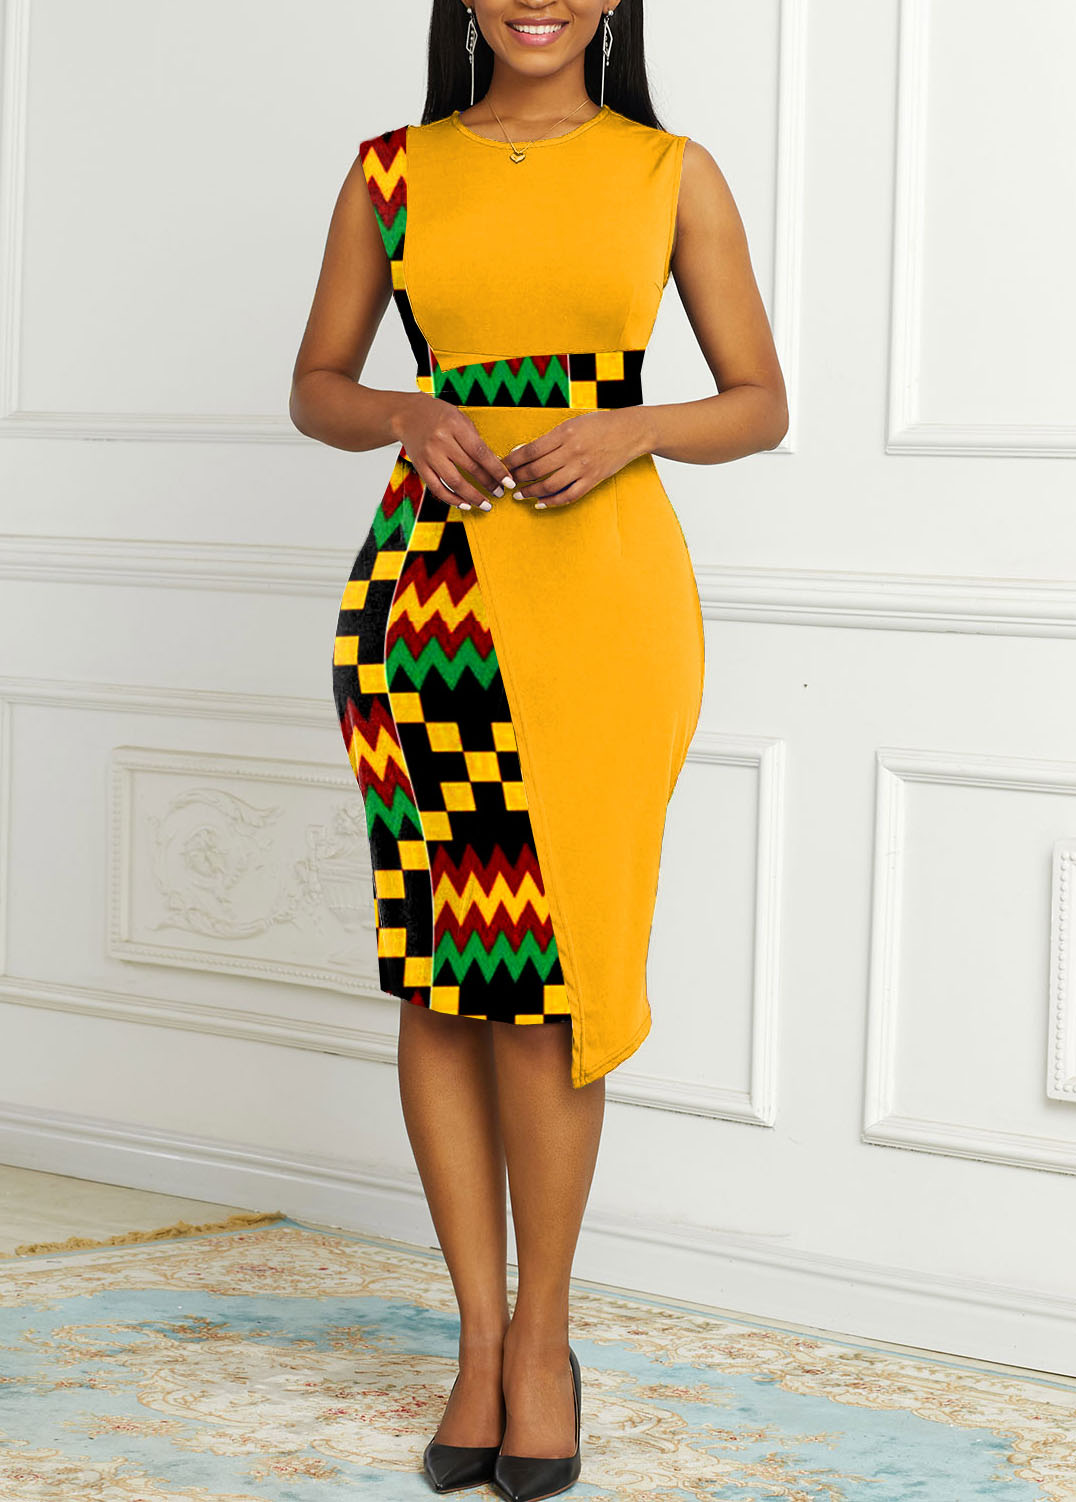 Tribal Print Round Neck Contrast Dress